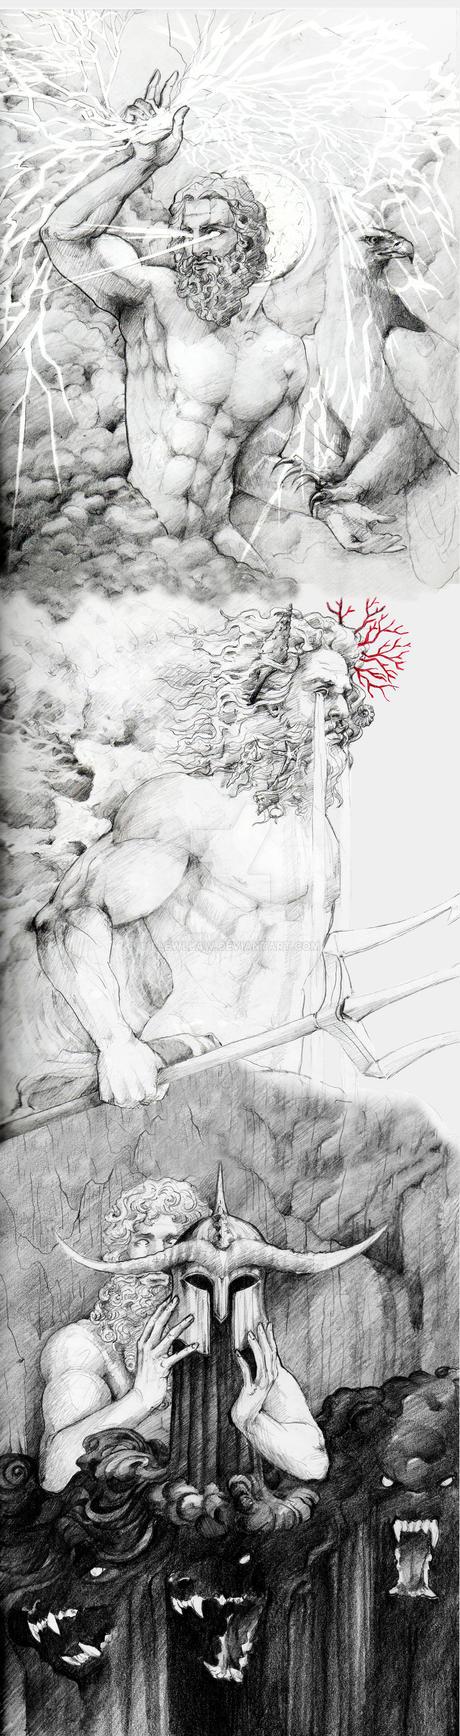 Zeus-Poseidon-Hades by llewllaw